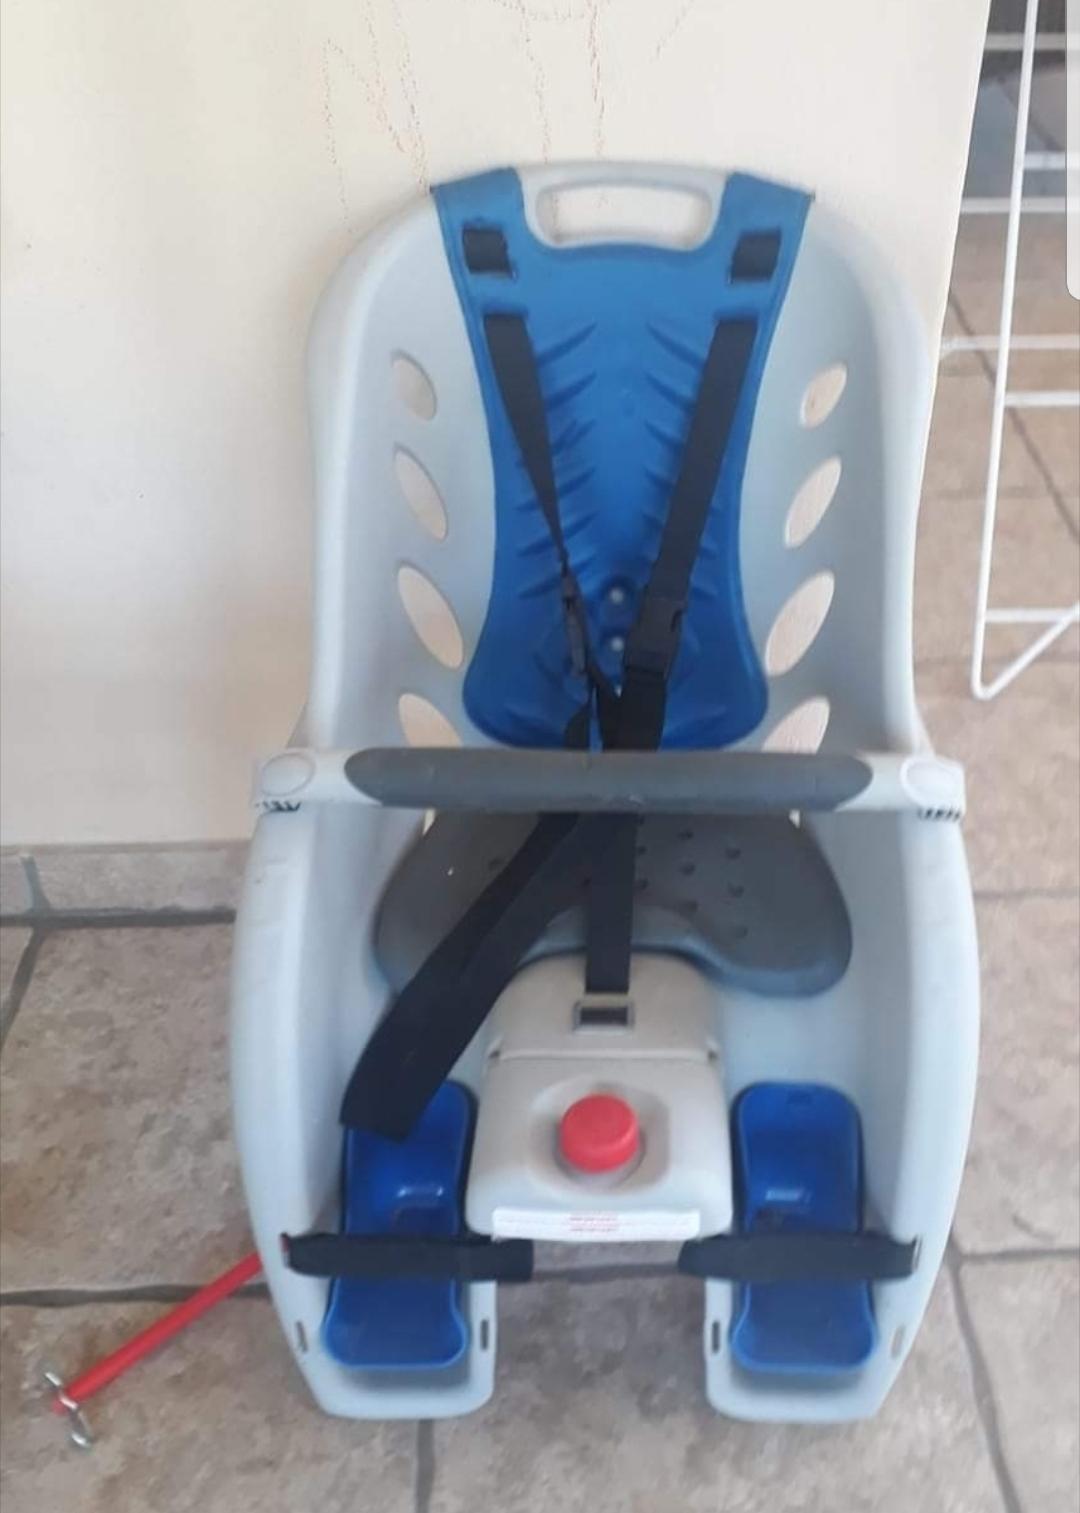 Fullsize Of Toddler Bike Seat